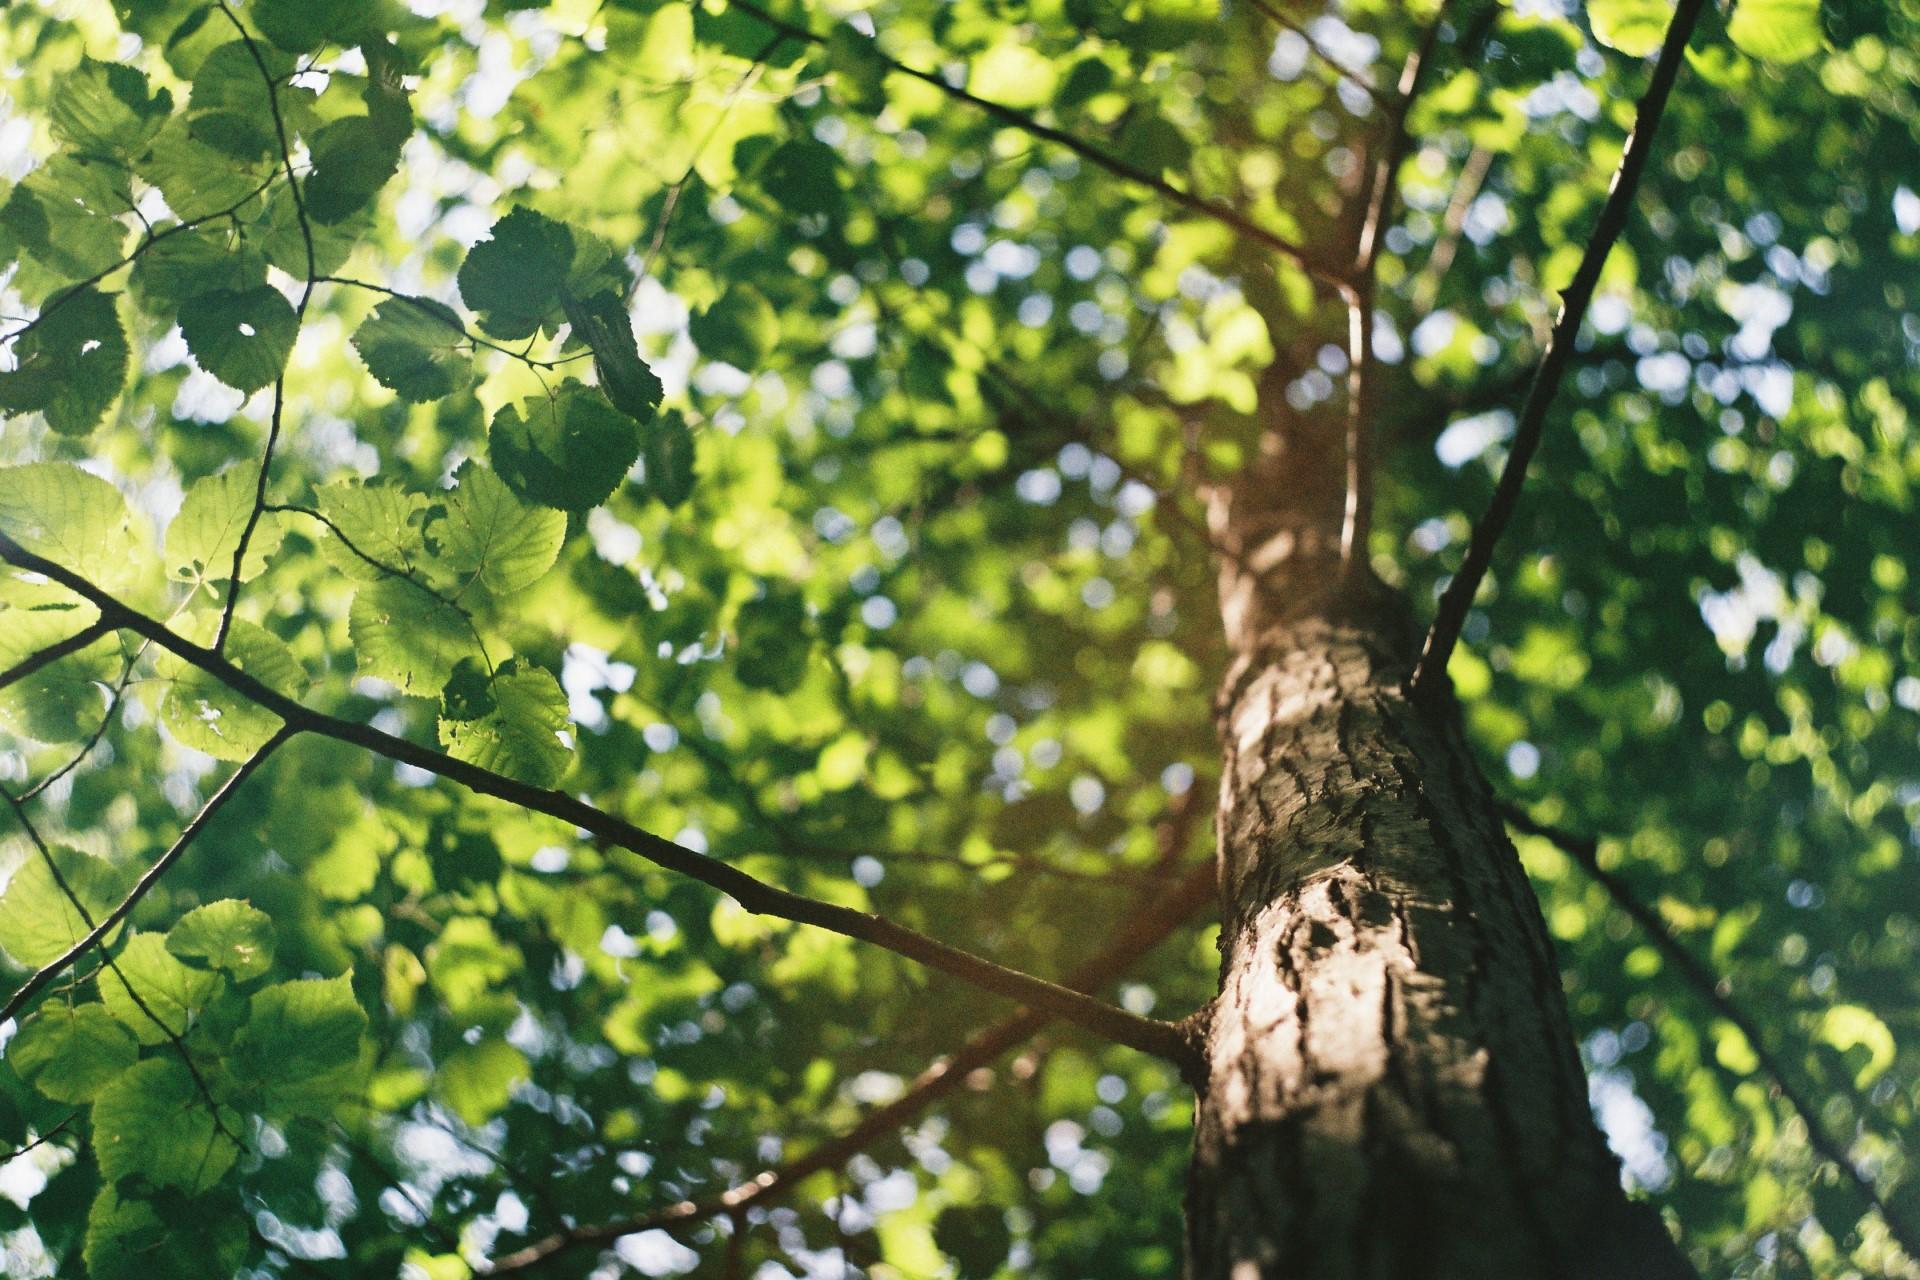 How Does Environmental Stewardship Impact Urban Ecology?